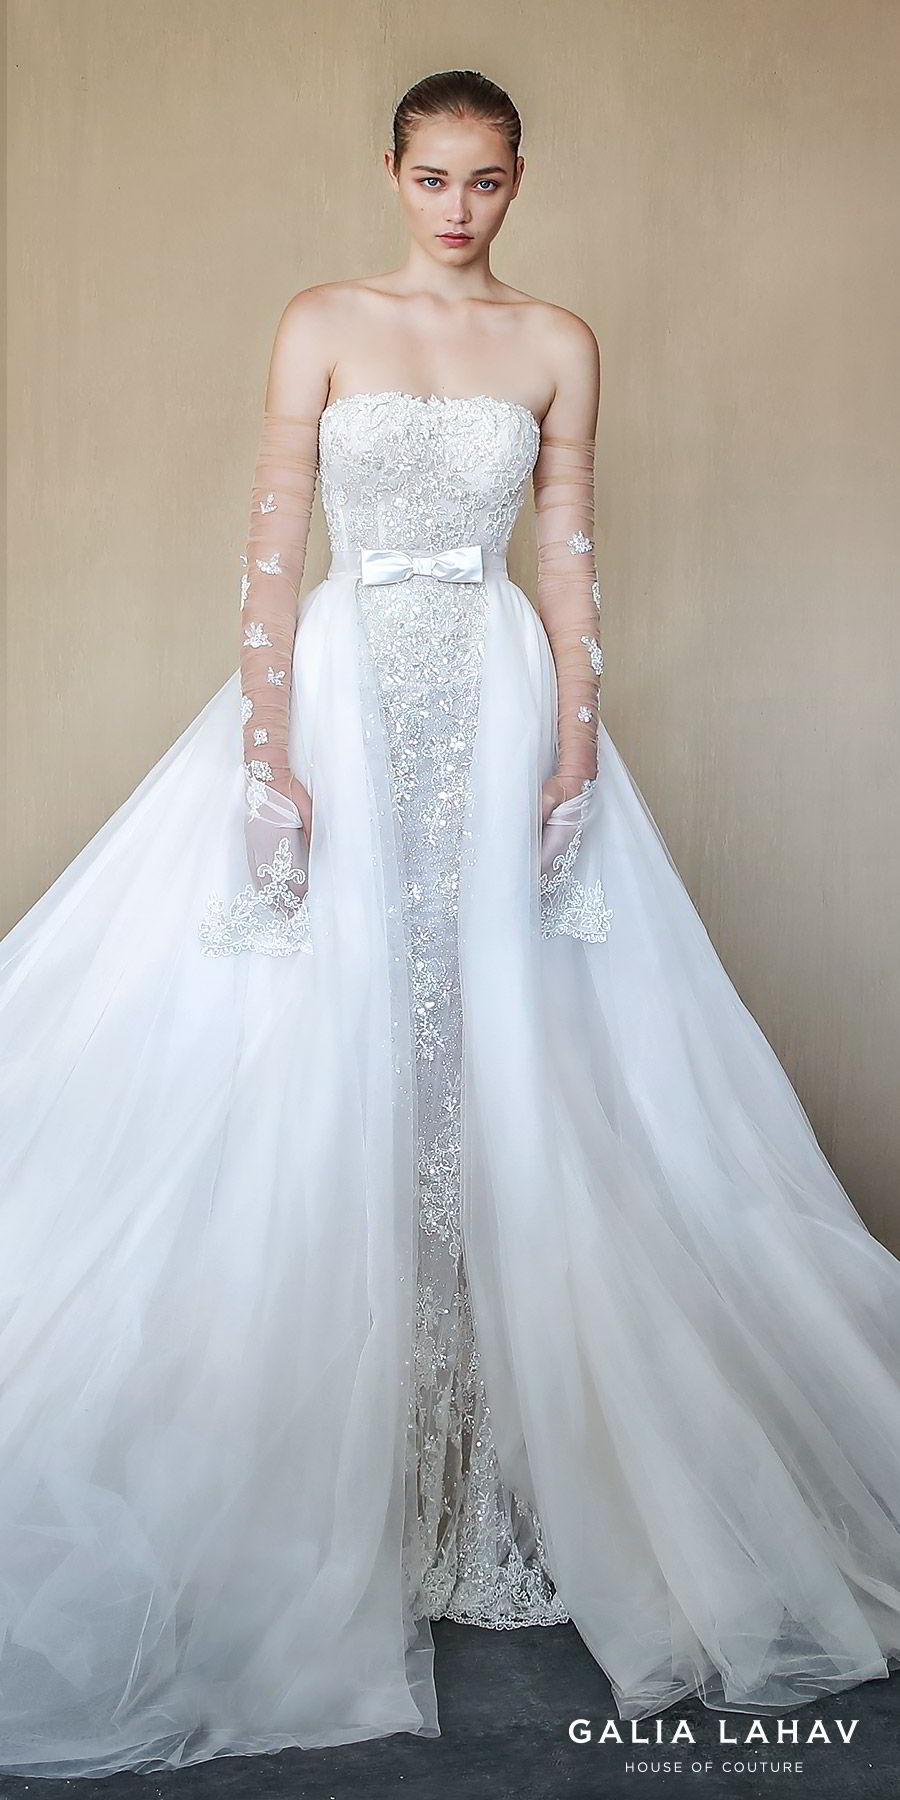 galia lahav fall 2019 bridal strapless straight across lace sheath mermaid wedding dress chapel train illusion a line overskirt gloves pockets elegant romantic (alba) zv